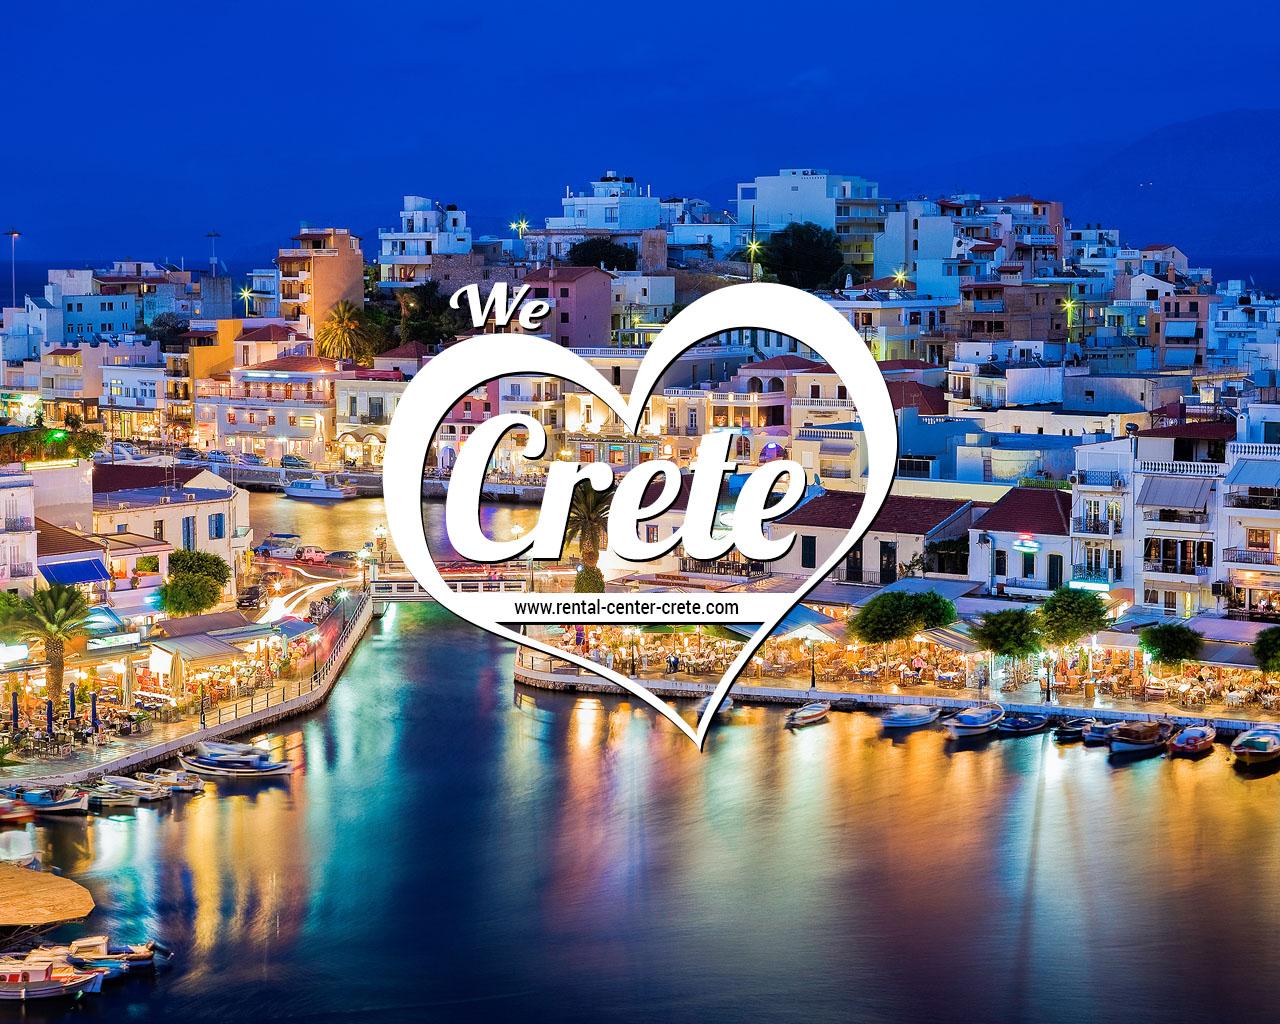 Freebie] Wallpapers of Crete Rental Center Crete 1280x1024